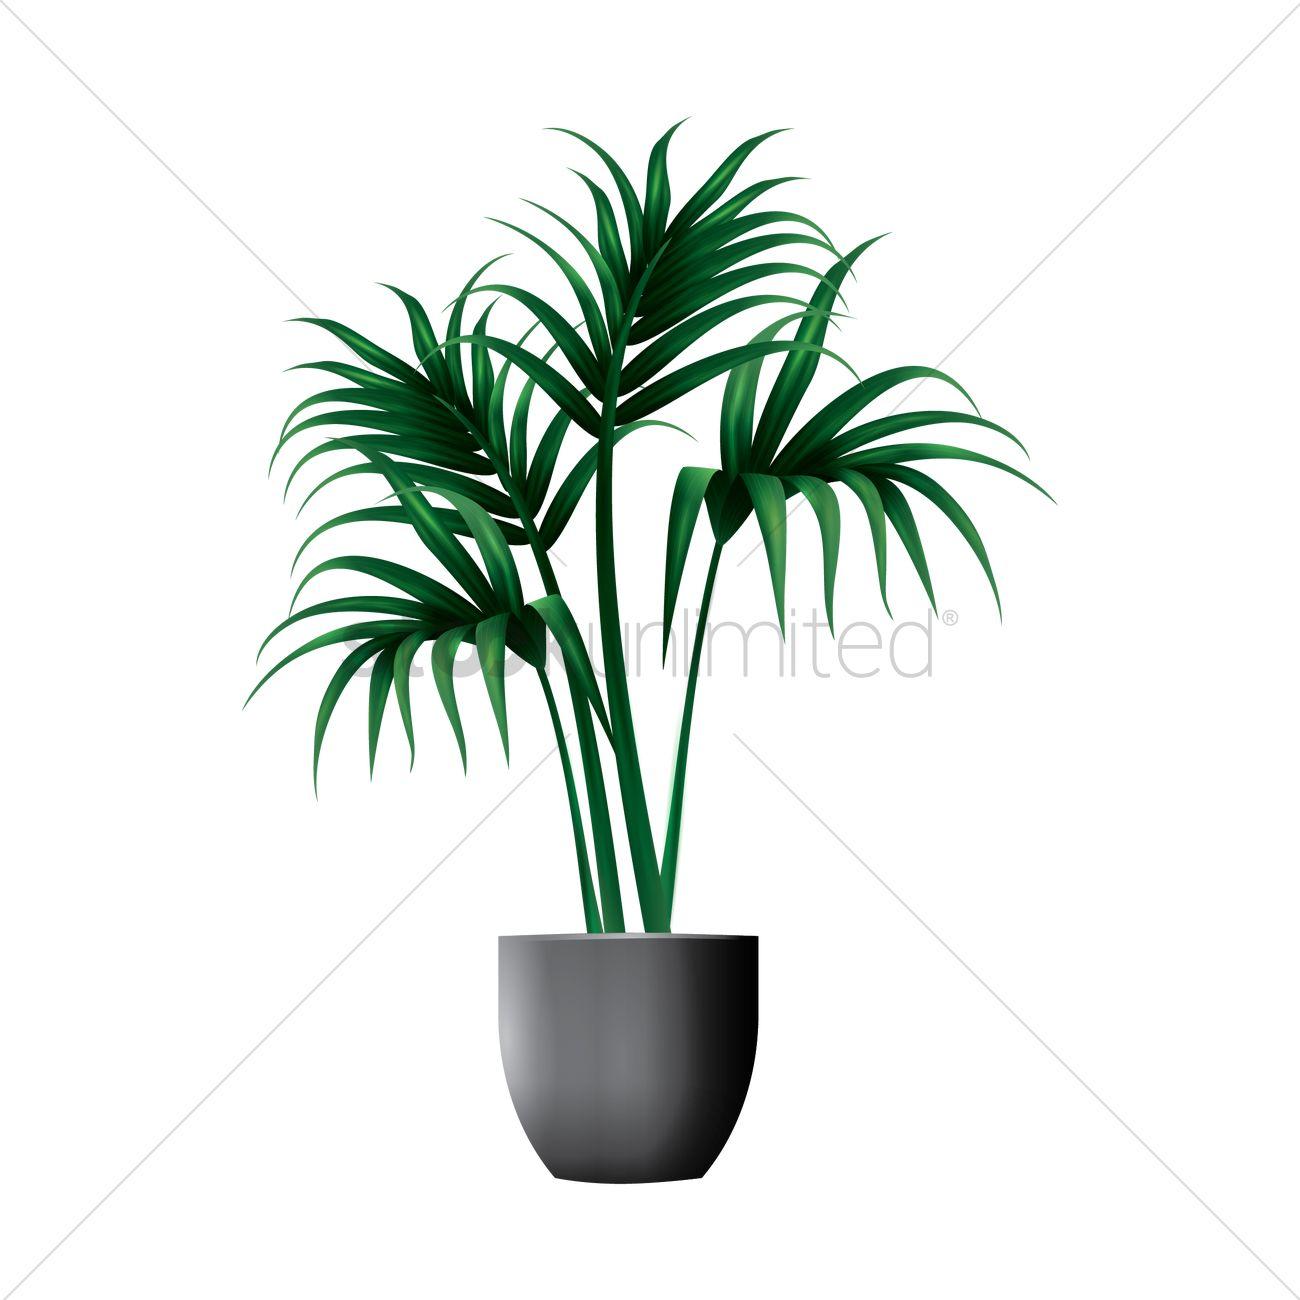 Kentia palm plant vector image 1944209 stockunlimited for Kentia pianta